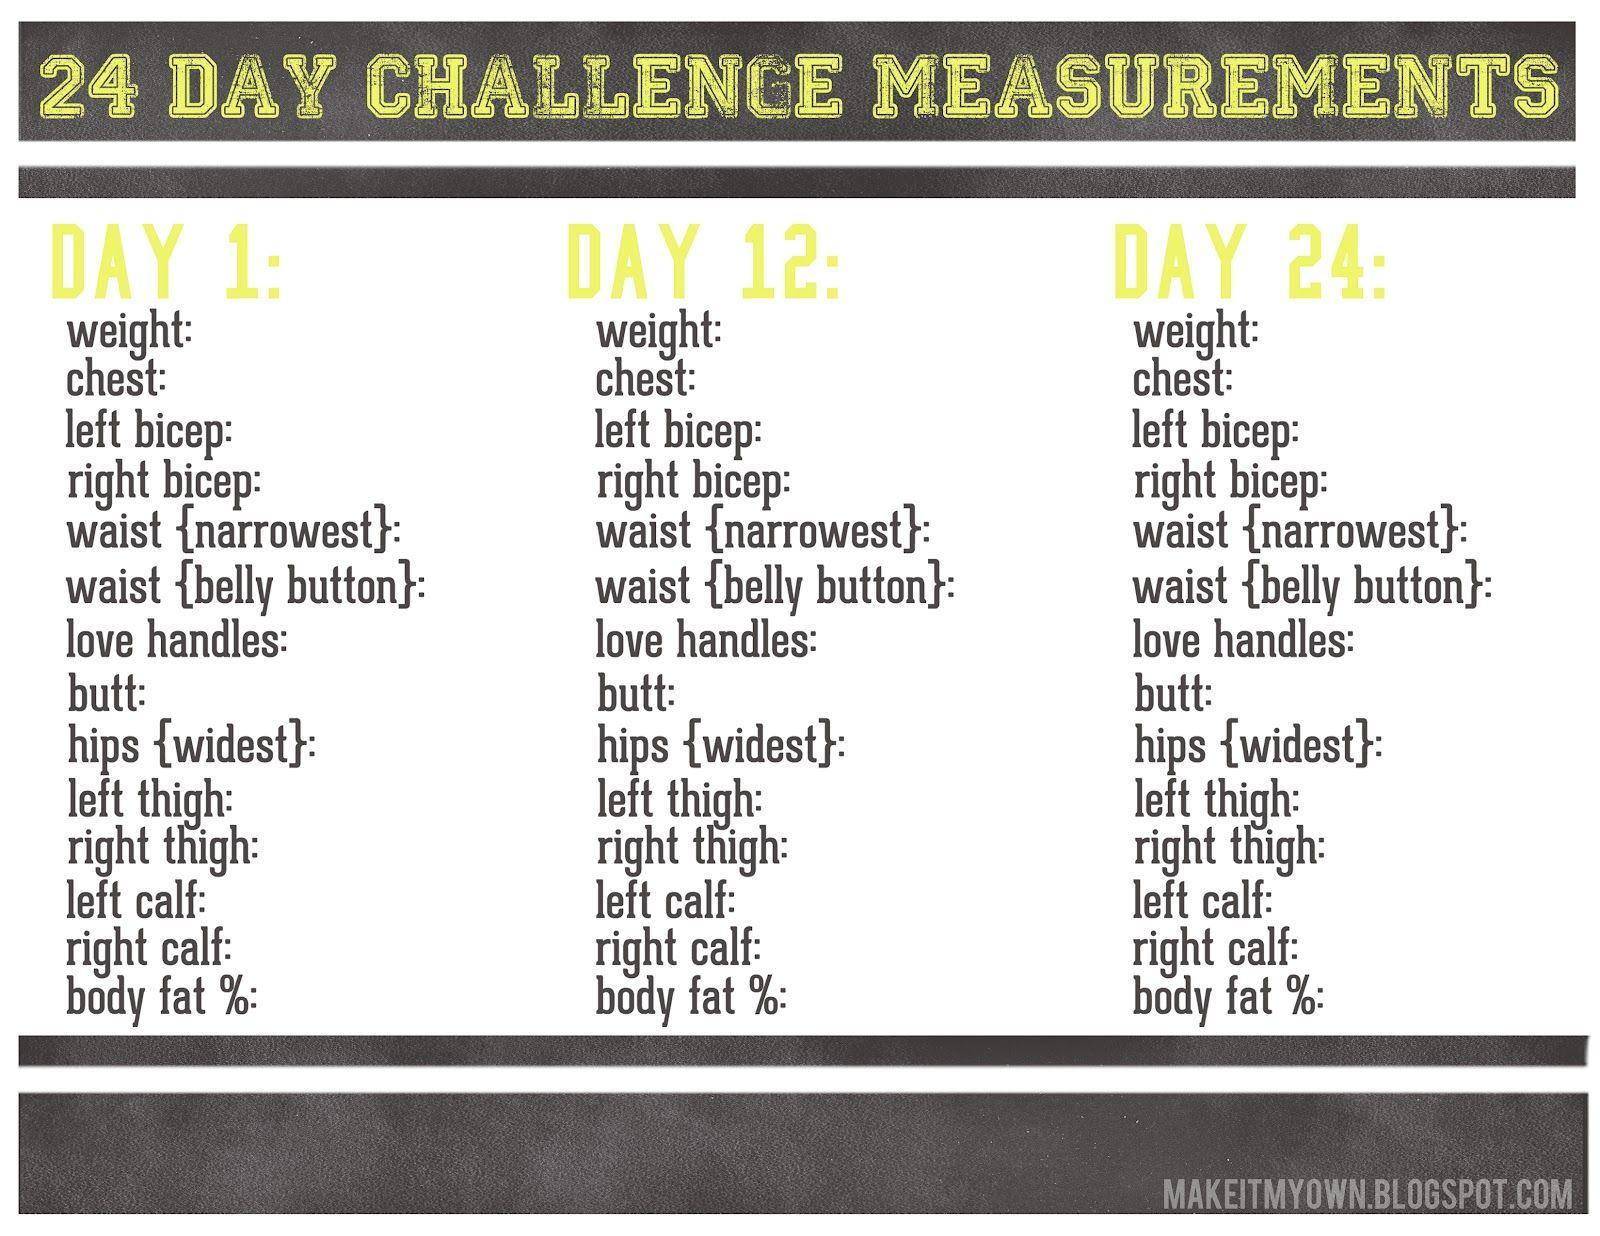 The Ruffled Sunshine 24 Day Challenge Measurement